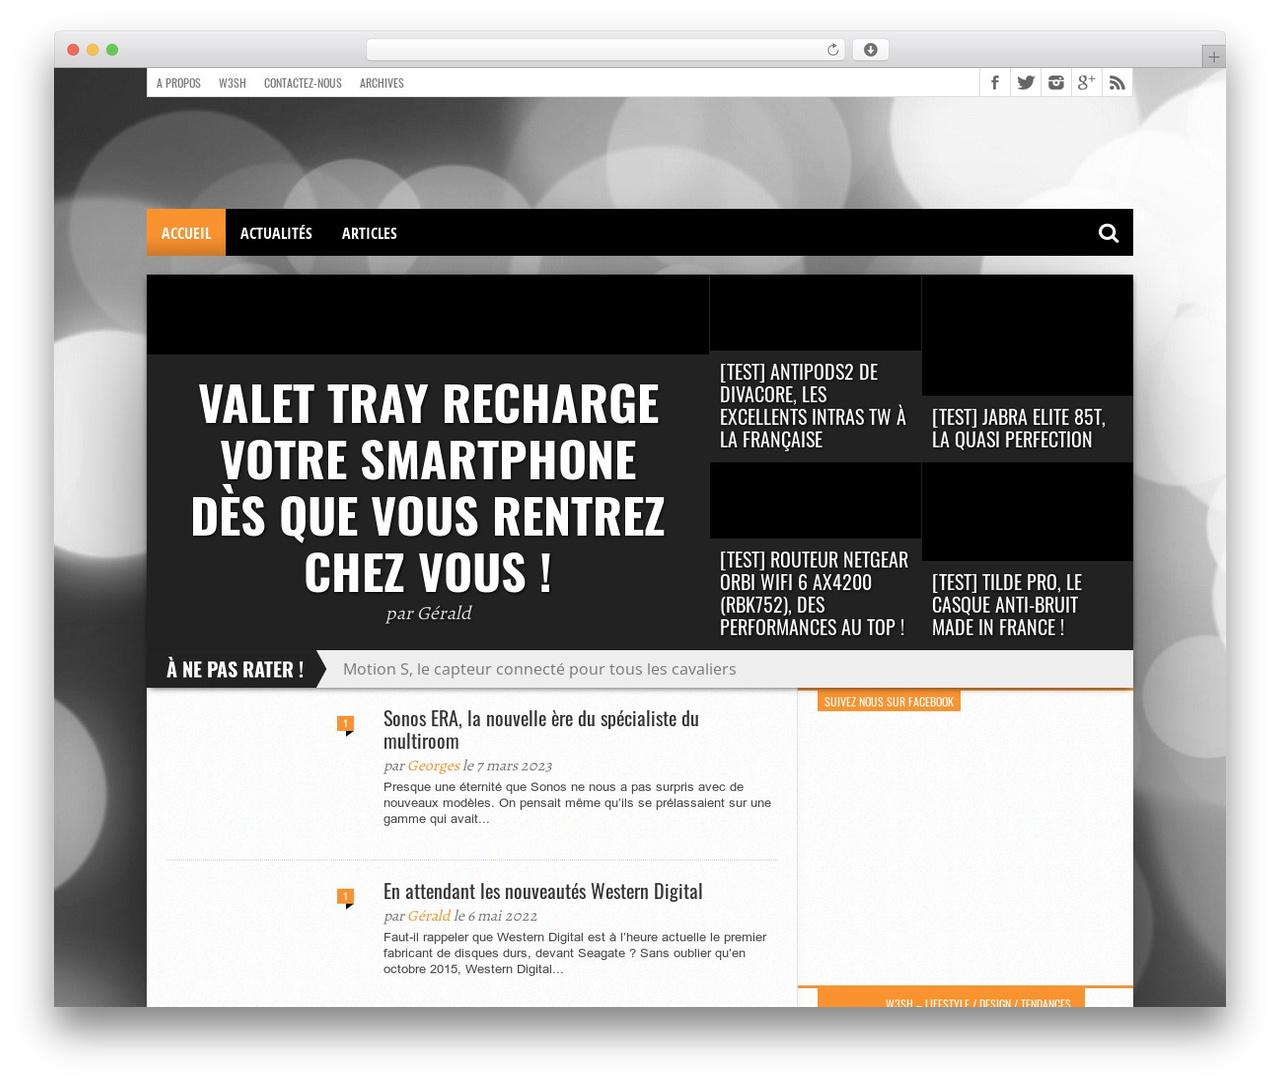 Topix Site